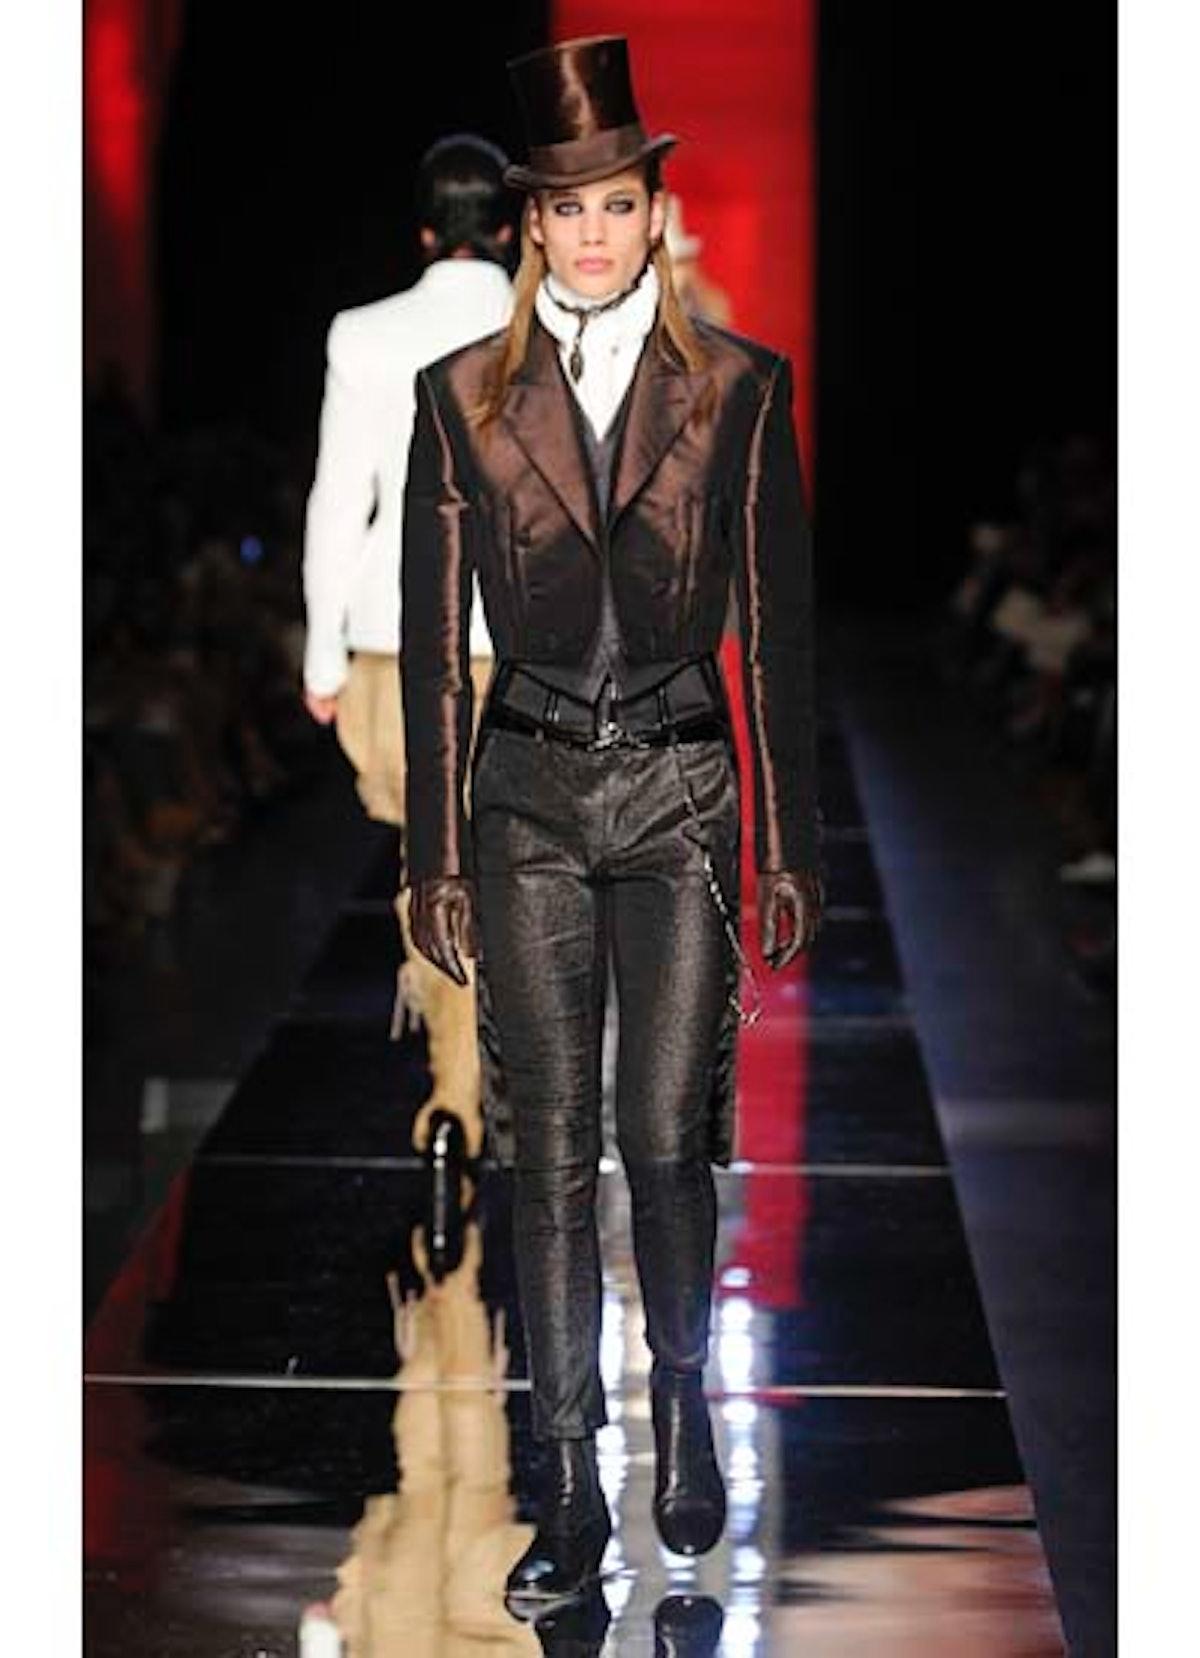 fass-jean-paul-gaultier-couture-2012-runway-22-v.jpg